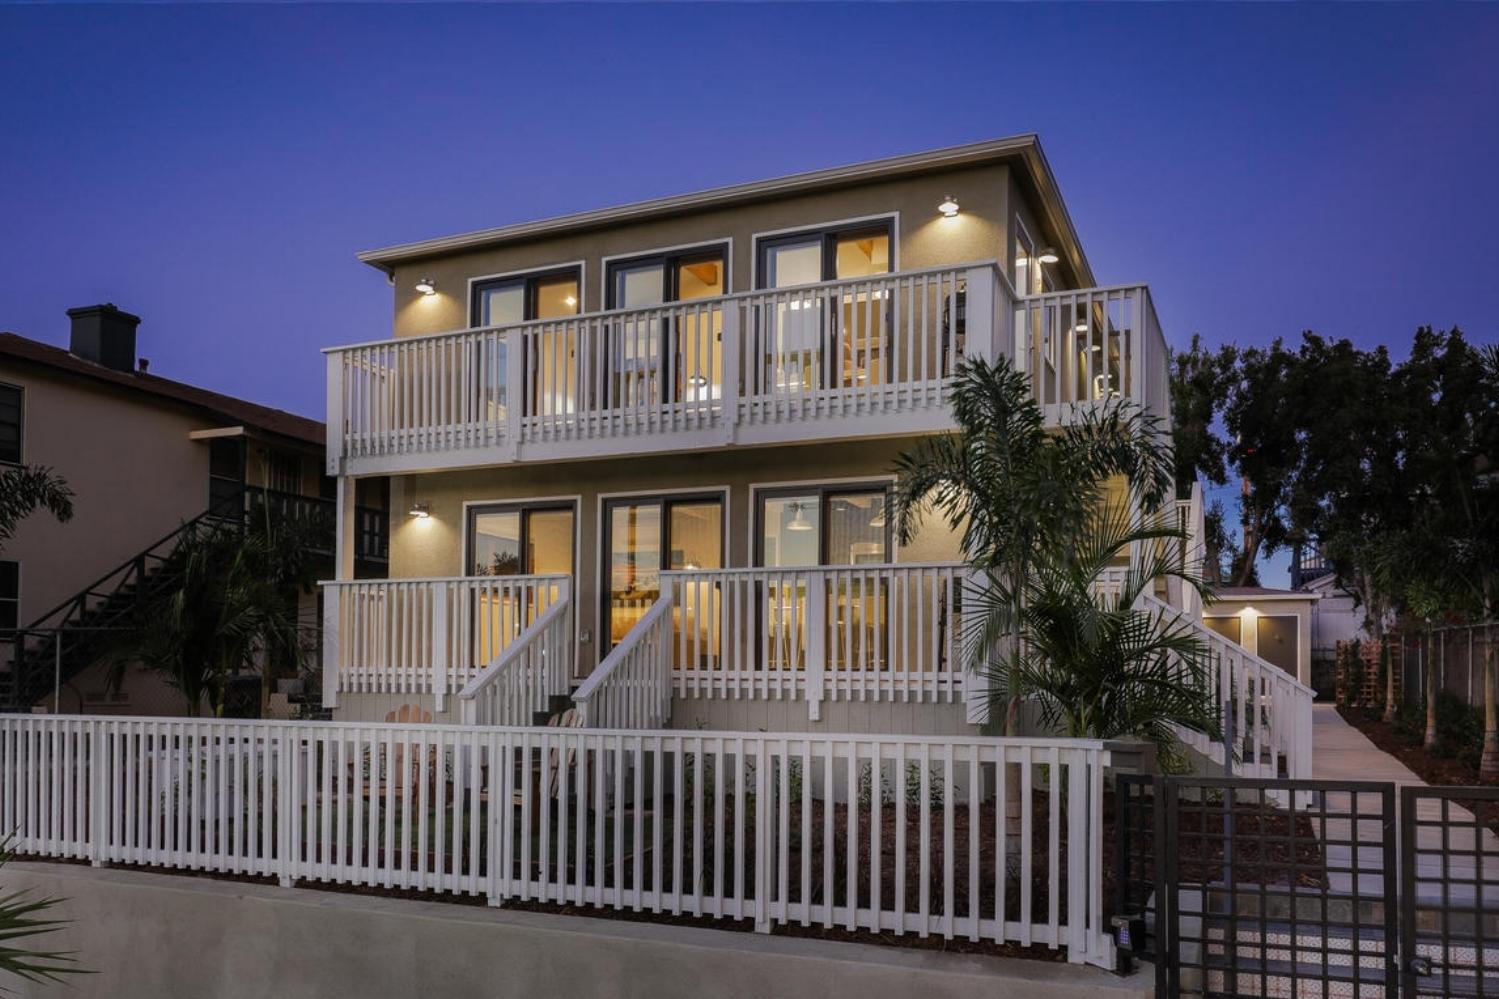 SAN DIEGO MODERN COASTAL APARTMENTS - A Stunning Apartment Building Transformation